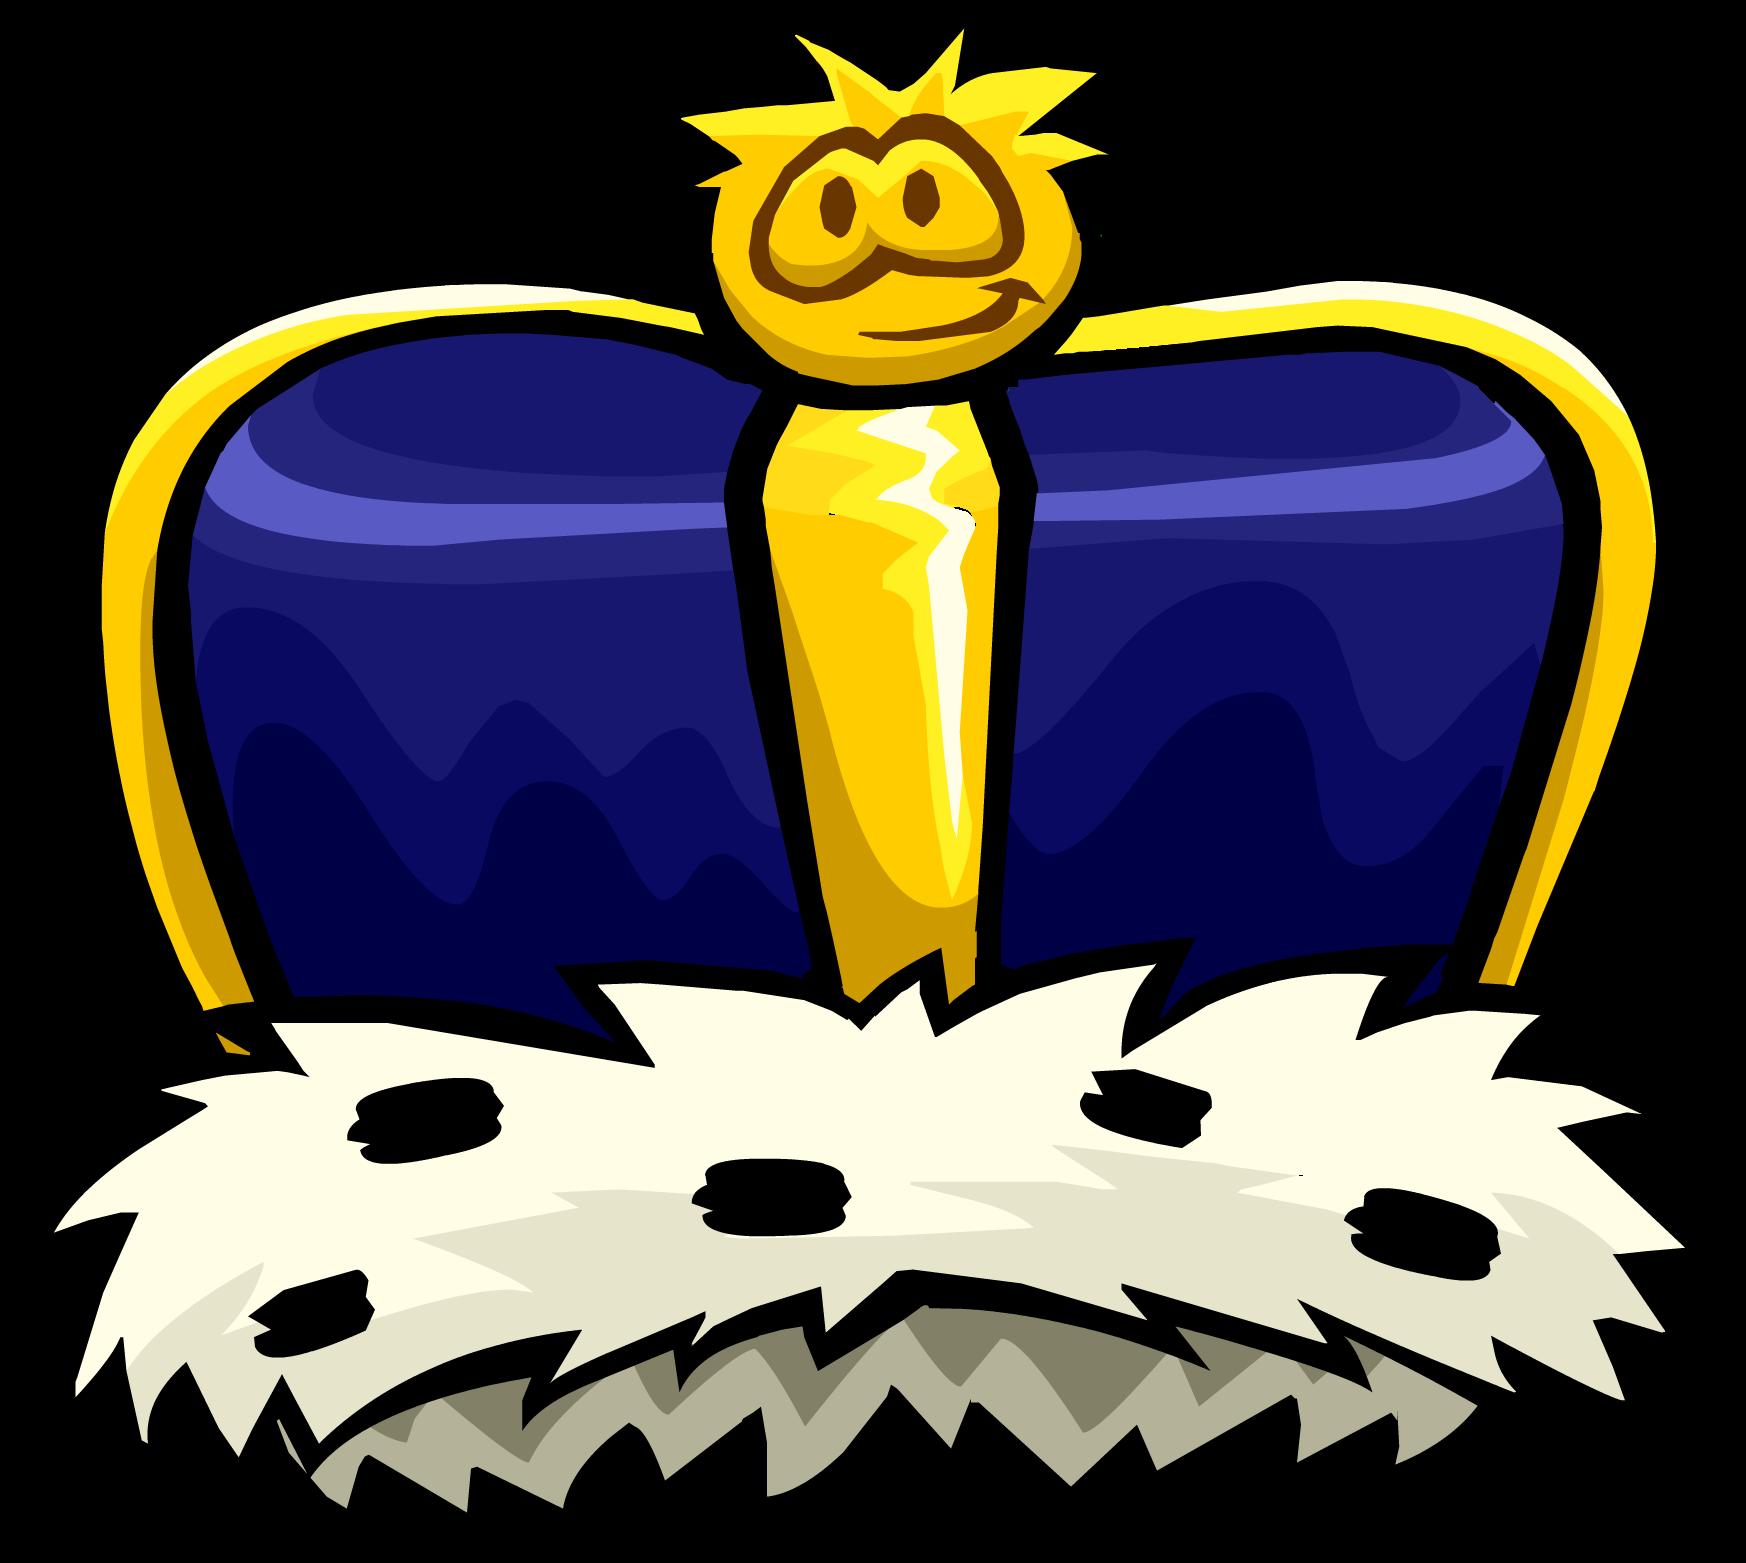 King's Blue Crown